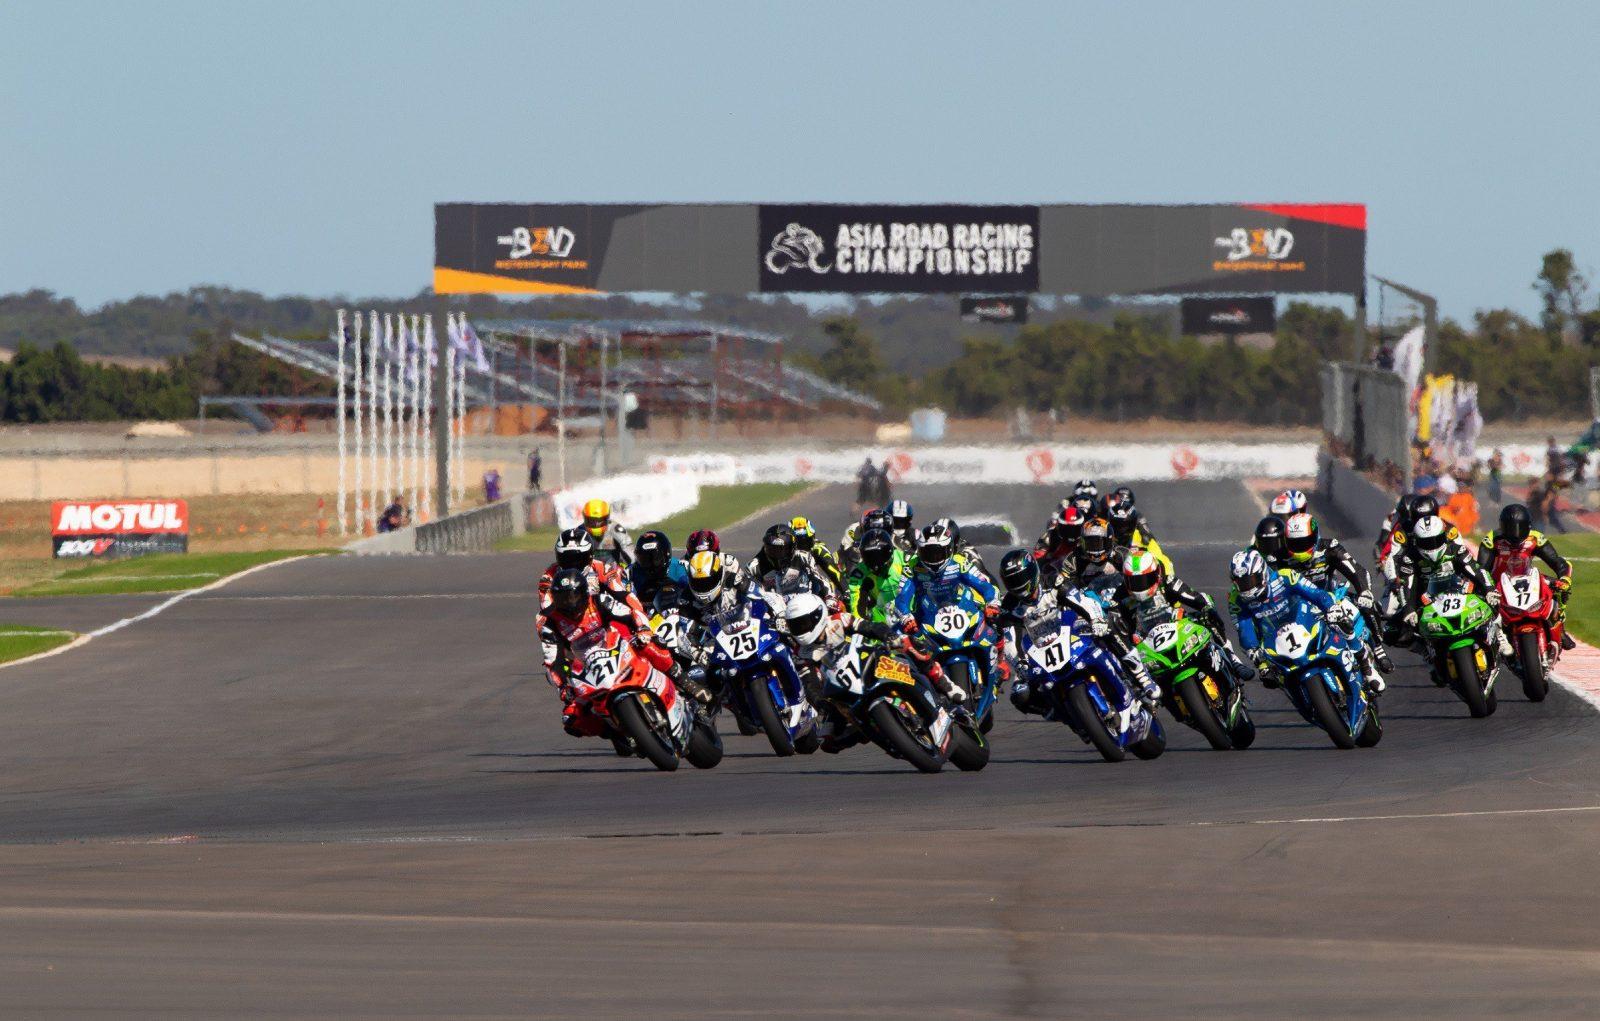 International MotoFest turn 1